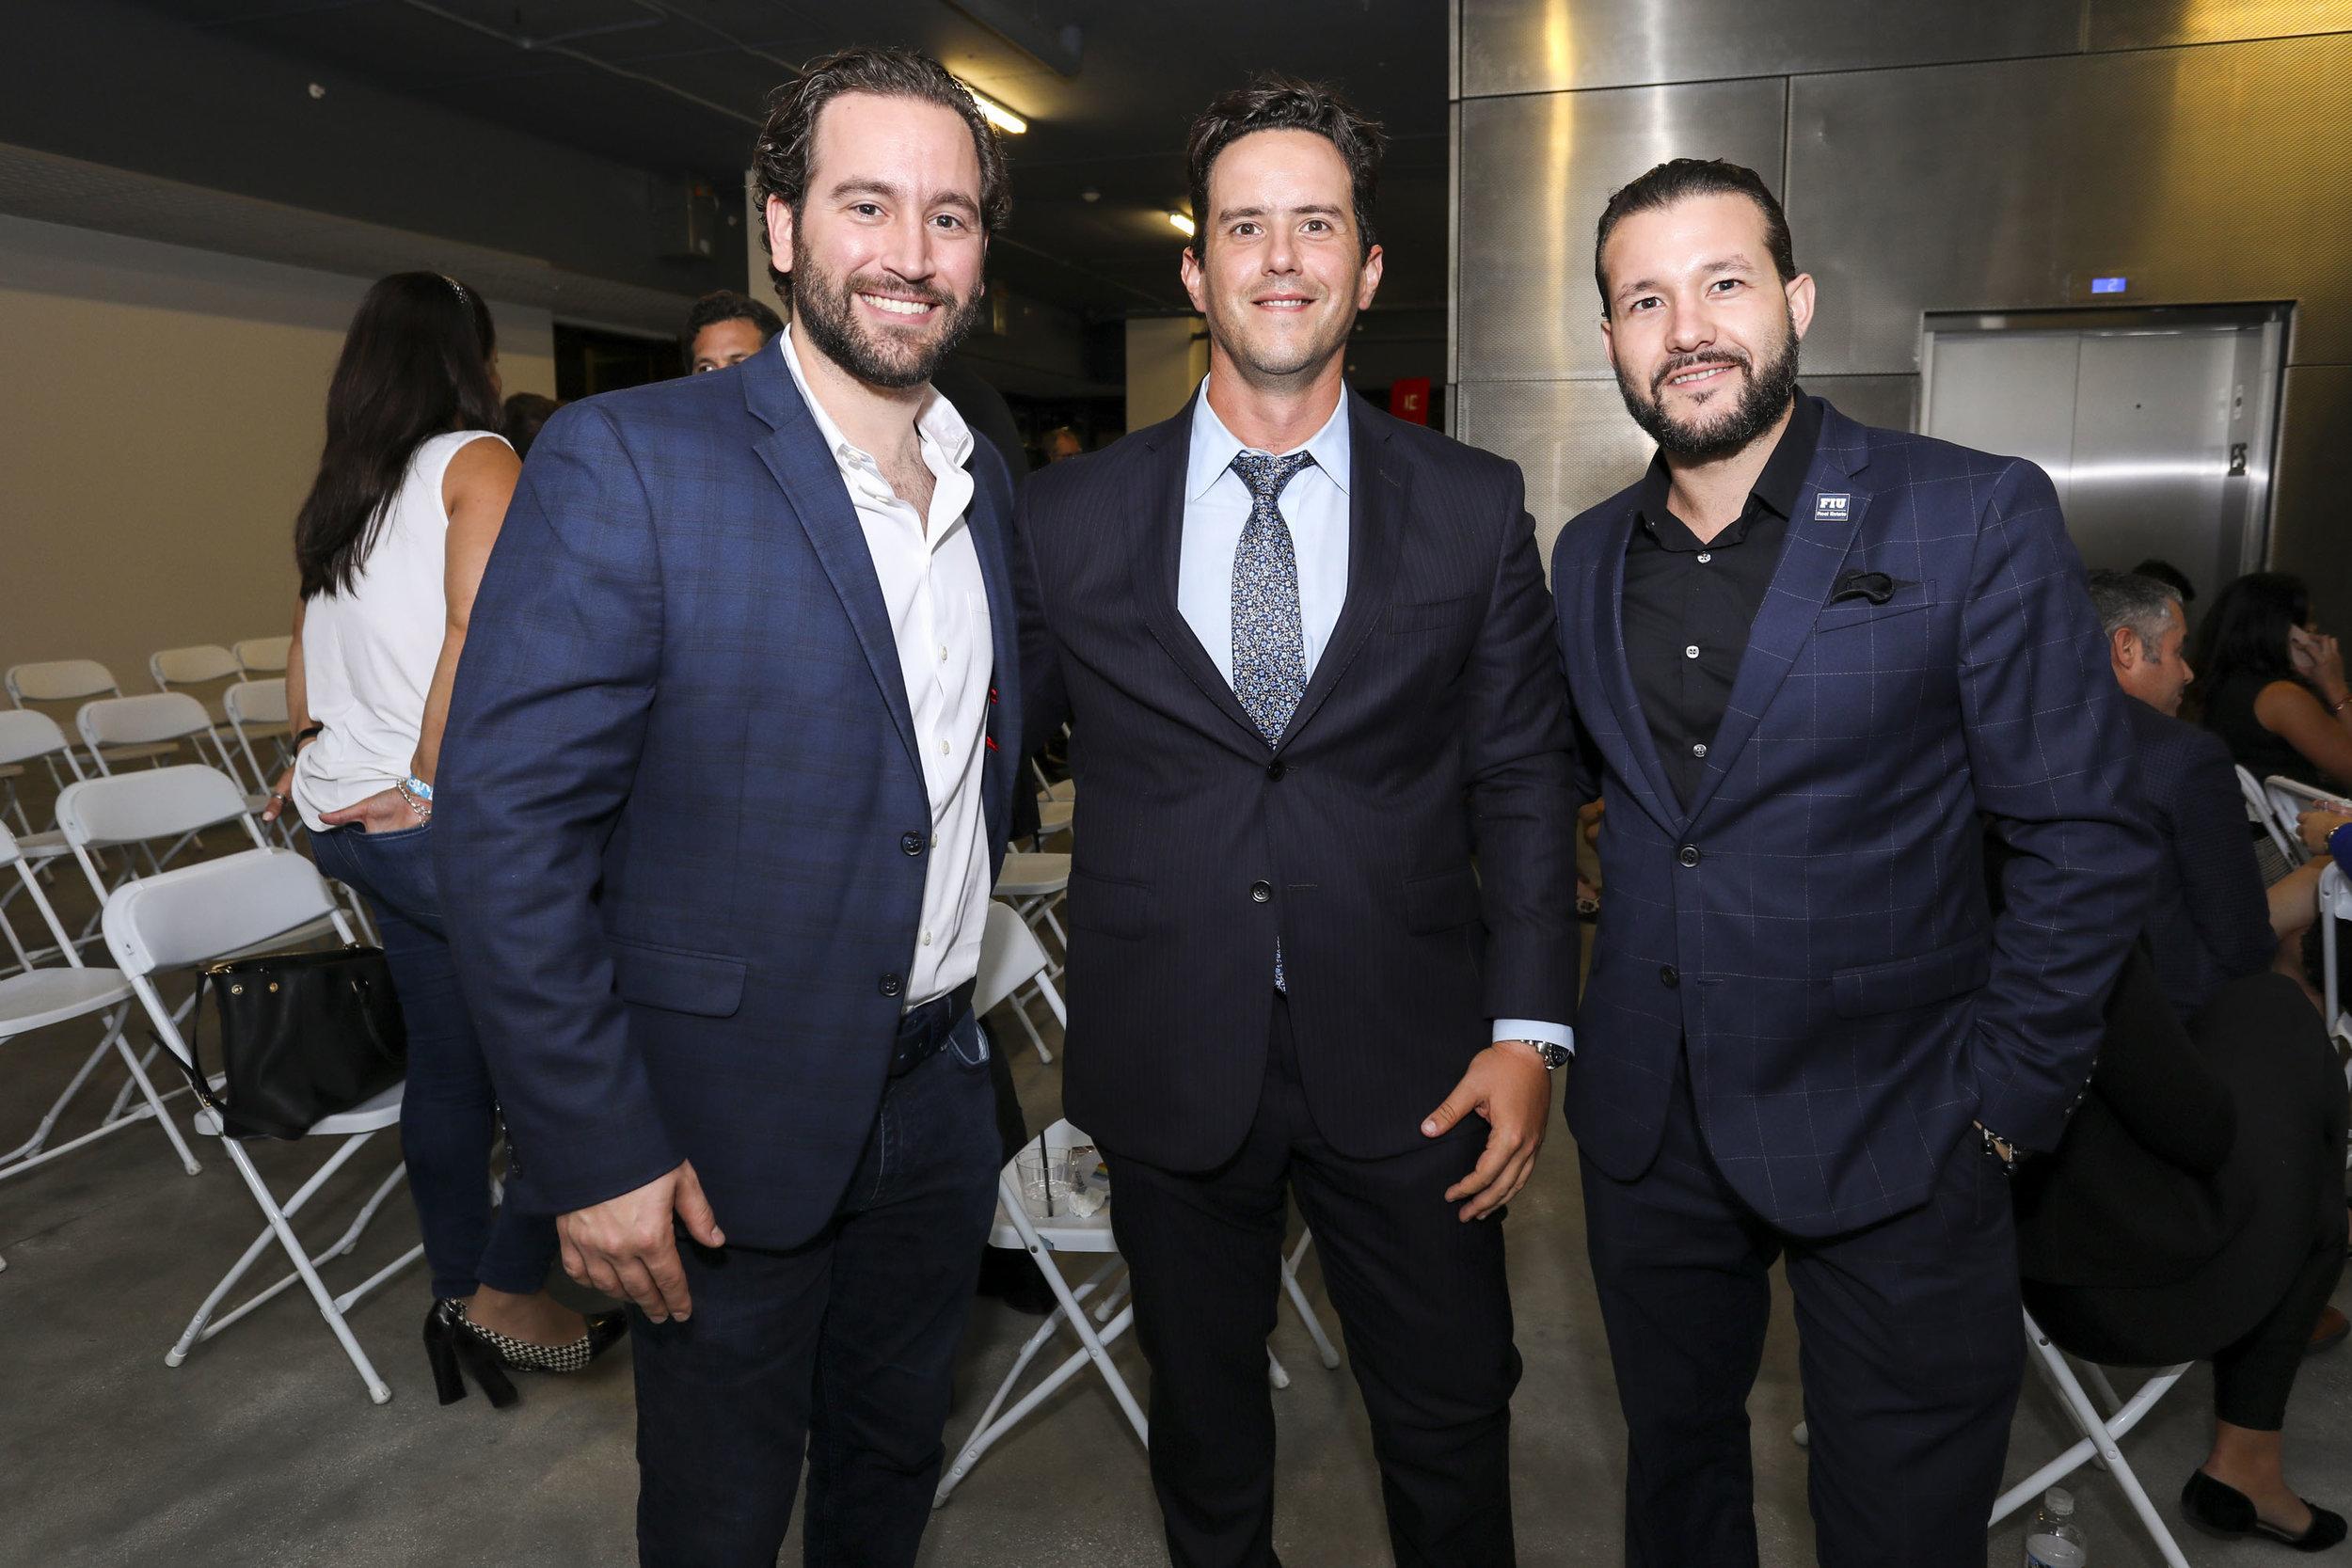 Freddy Diaz, Denis Ramos and Manuel Vidal.